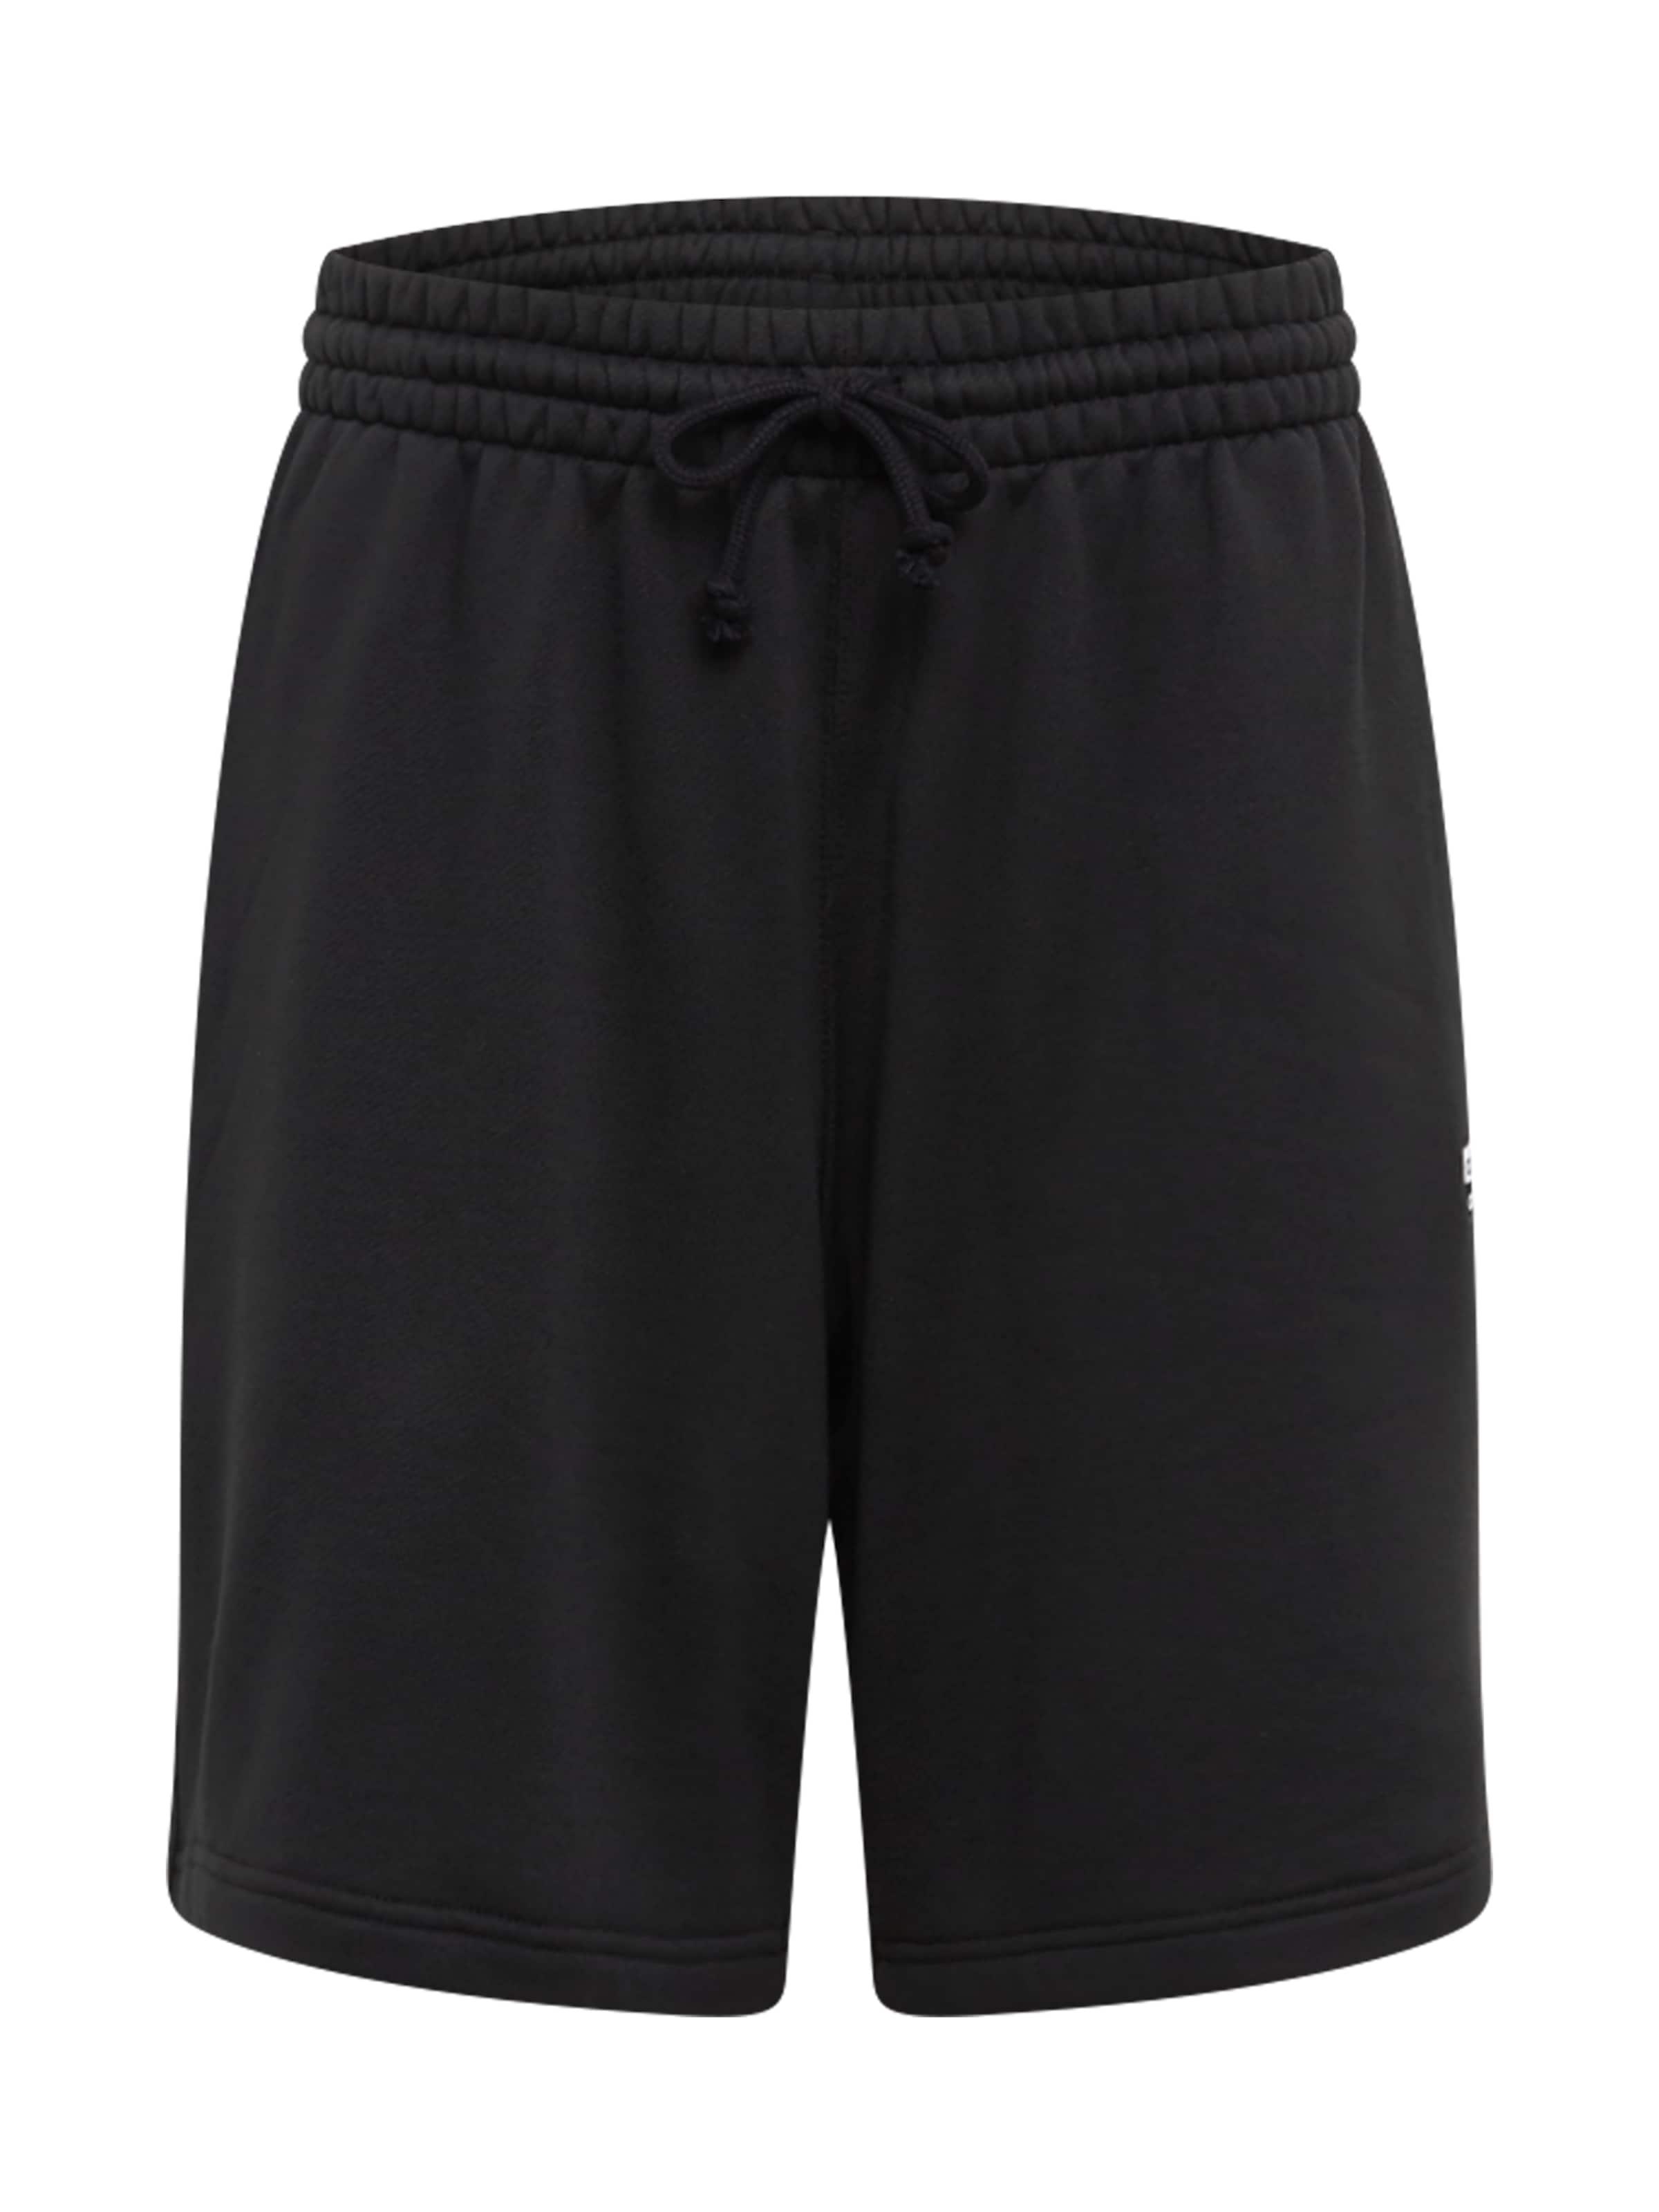 Originals Noir Pantalon 'vocal Short' En Adidas rBdoCeWx